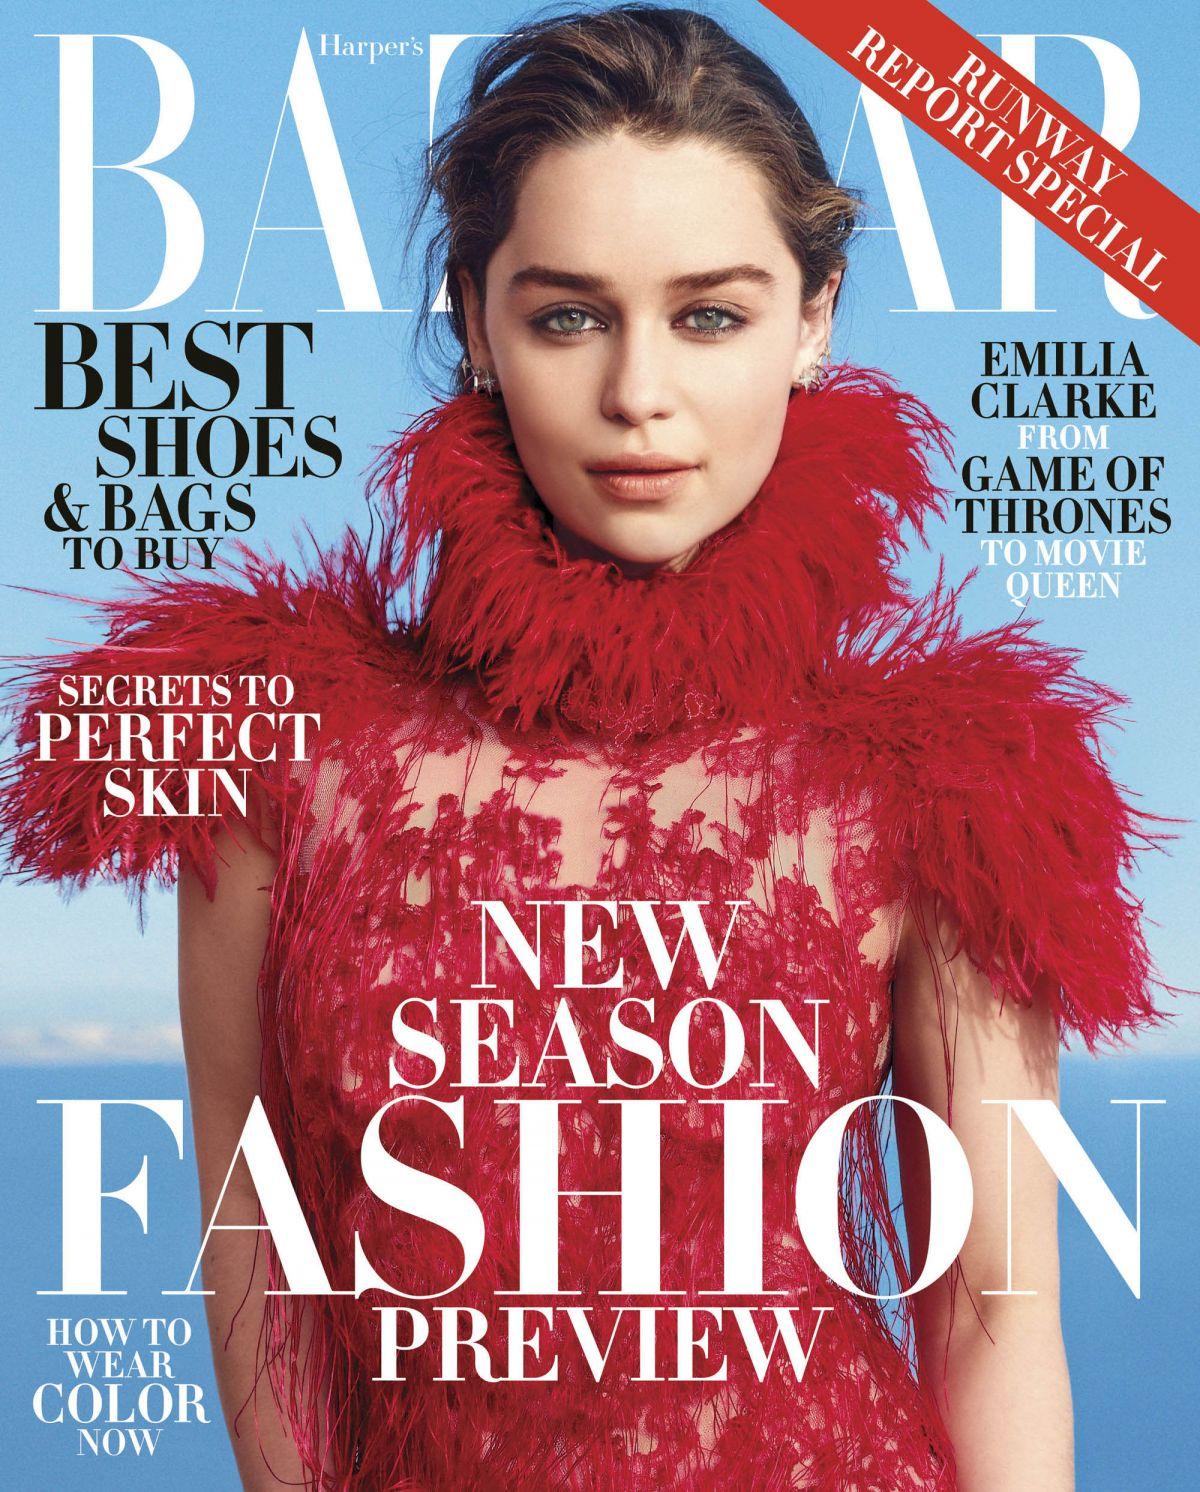 EMILIA CLARKE in Harper's Bazaar Magazine, June 2015 Issue ...